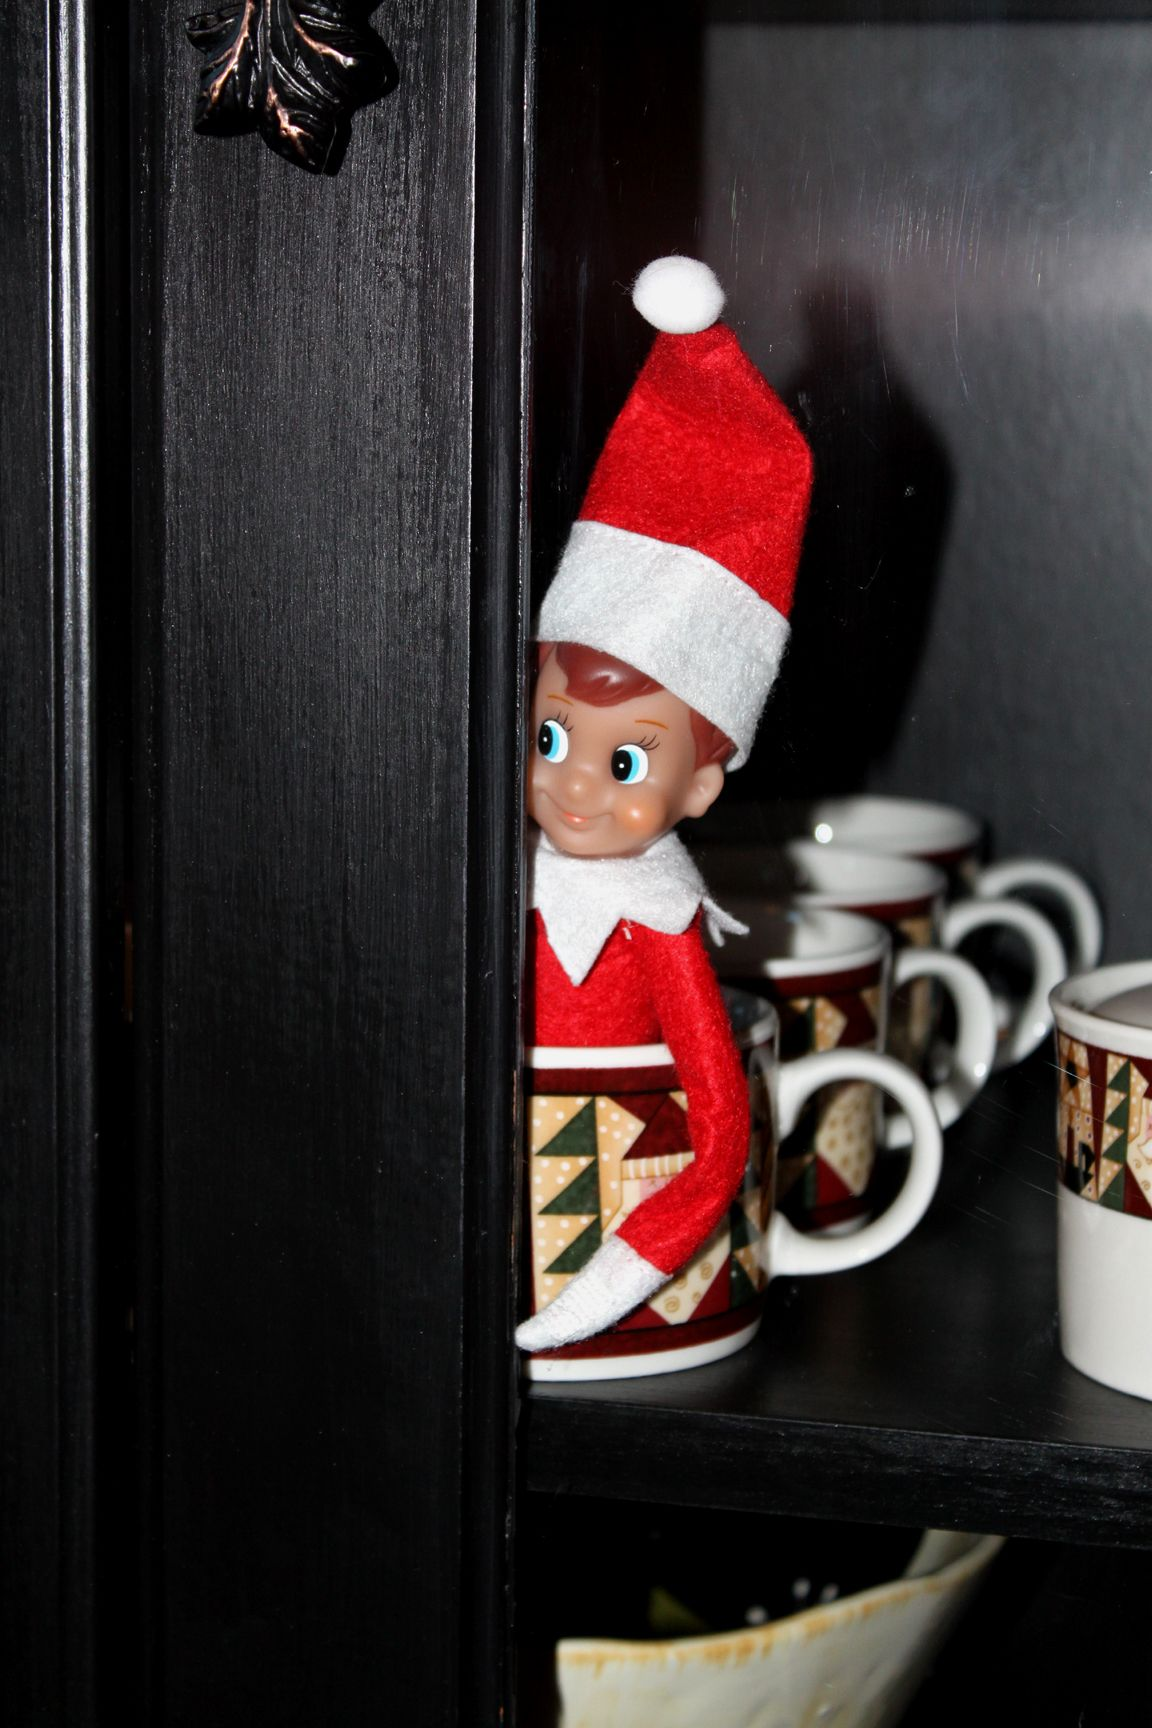 Playing hidenseek Elf, Christmas elf, Elf on the shelf